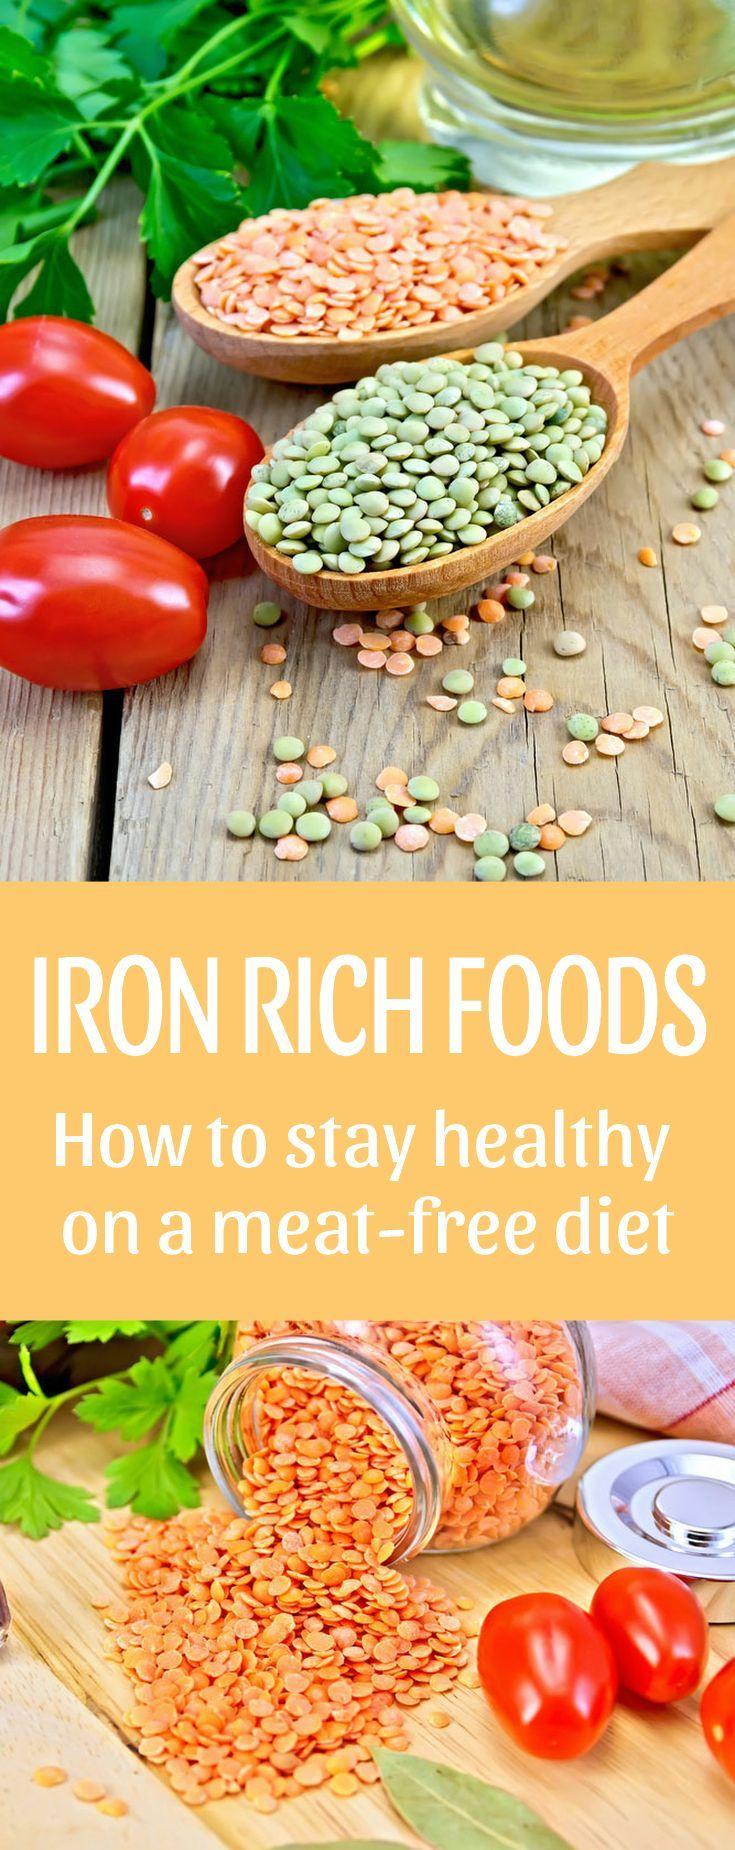 Iron rich foods Vitamins for vegetarians, Iron rich